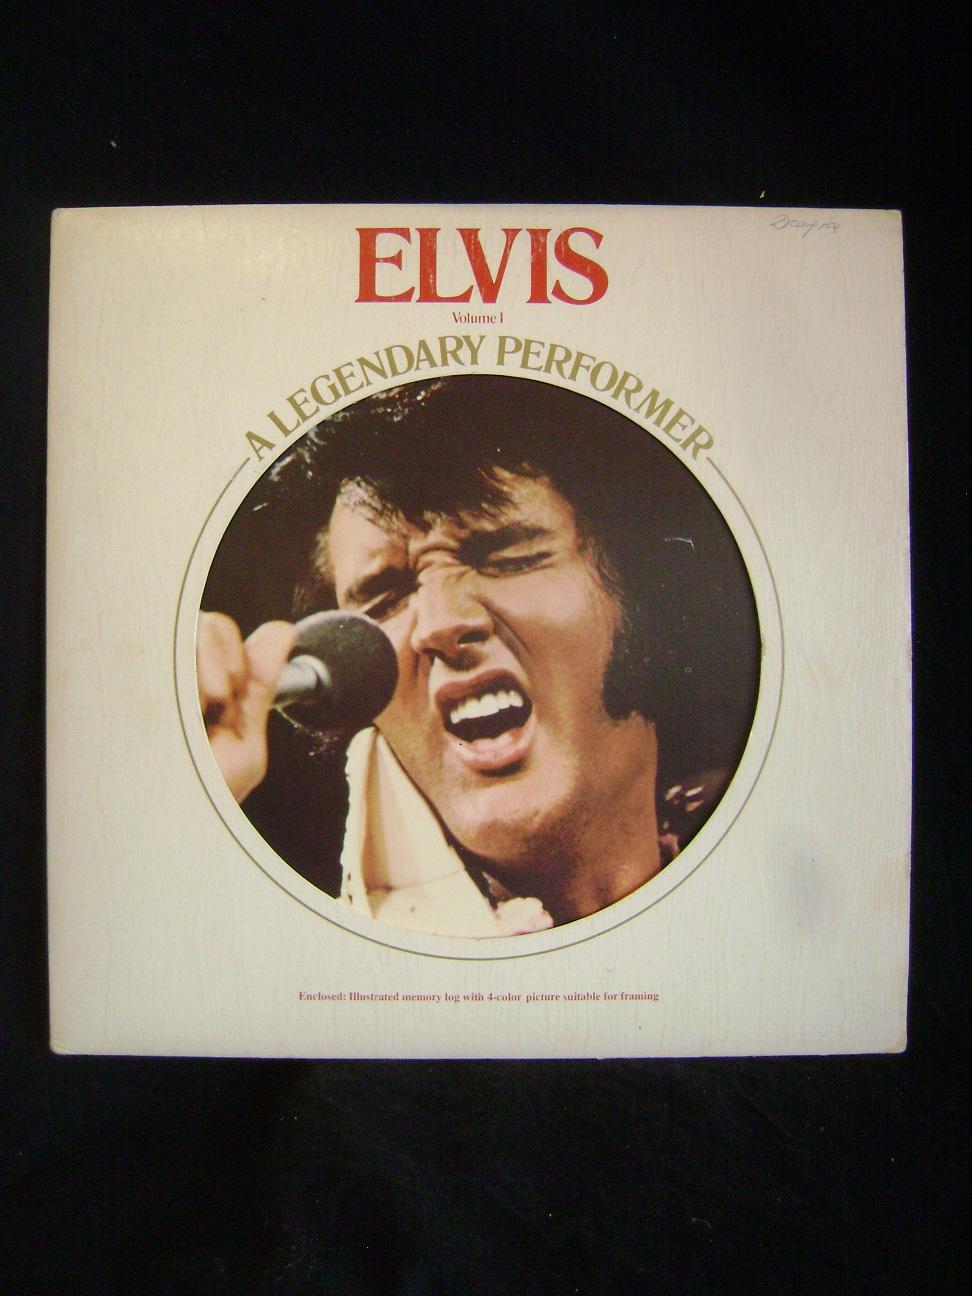 Ploca_LP_Elvis_Presley_A_Legendary_Performer_1.JPG